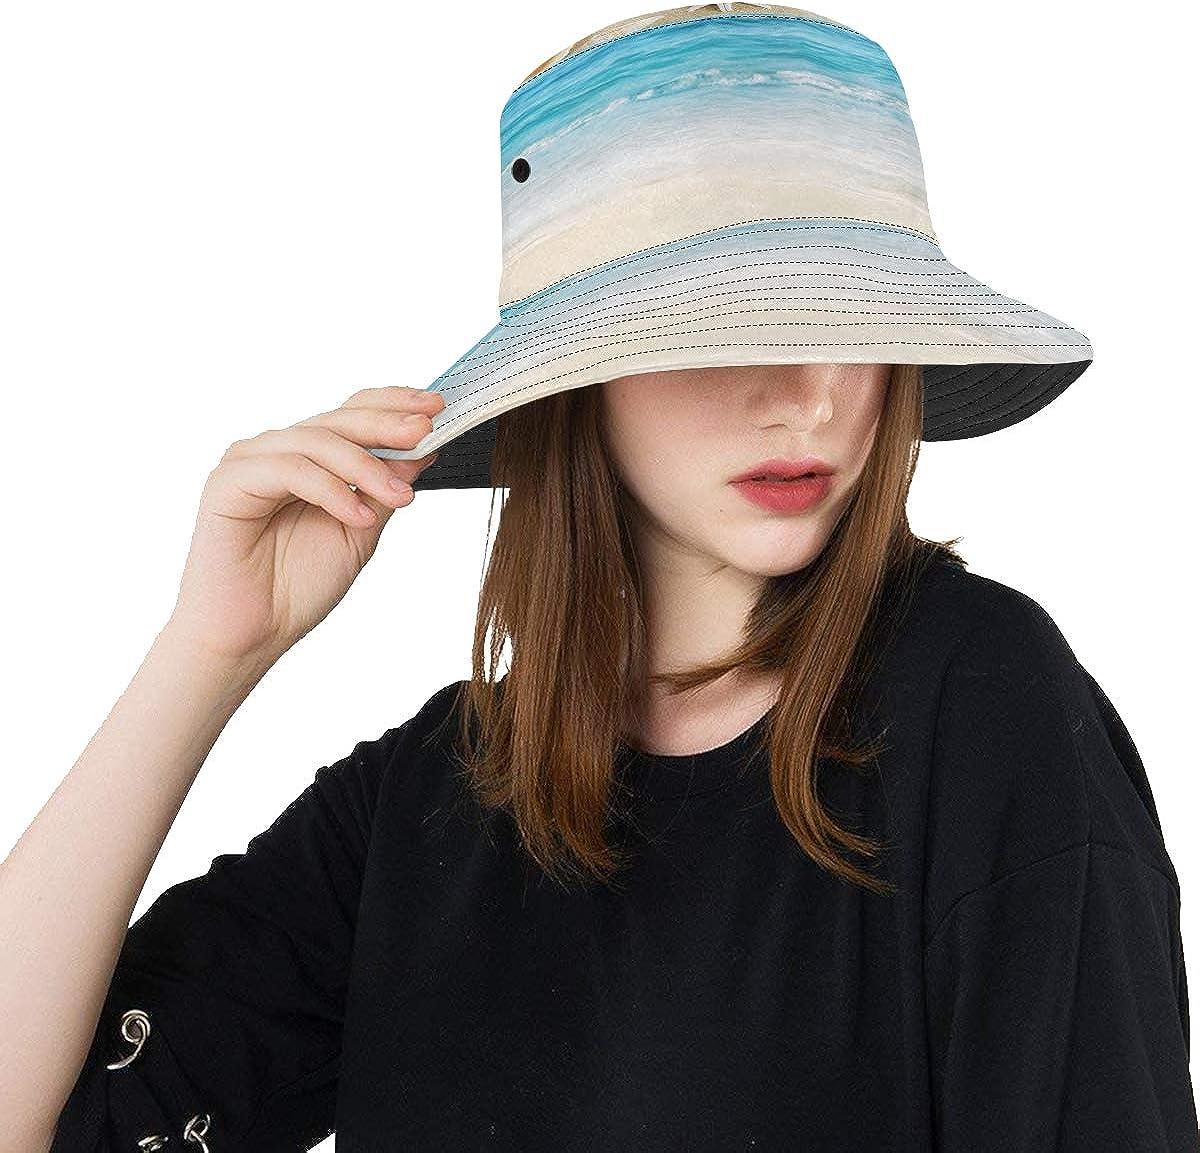 Woman Finally popular brand New life Bucket Hat Landscape Shells Unise Summer On Tropical Beach